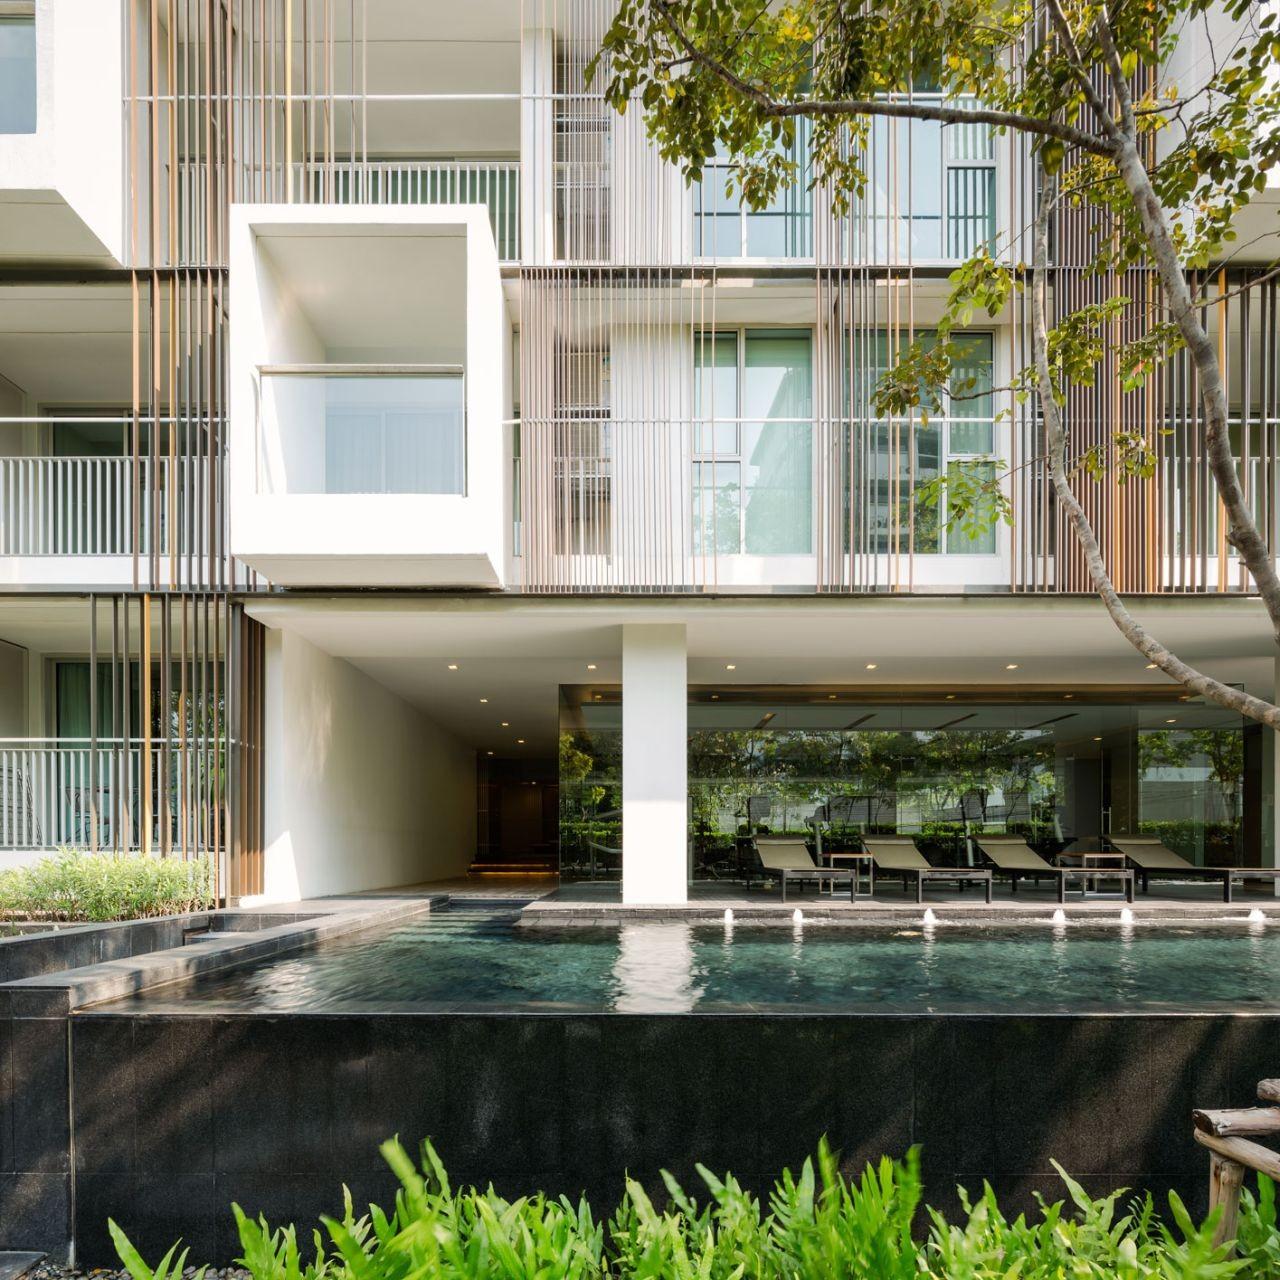 Gallery of via 31 somdoon architects ltd 12 for Architect ltd